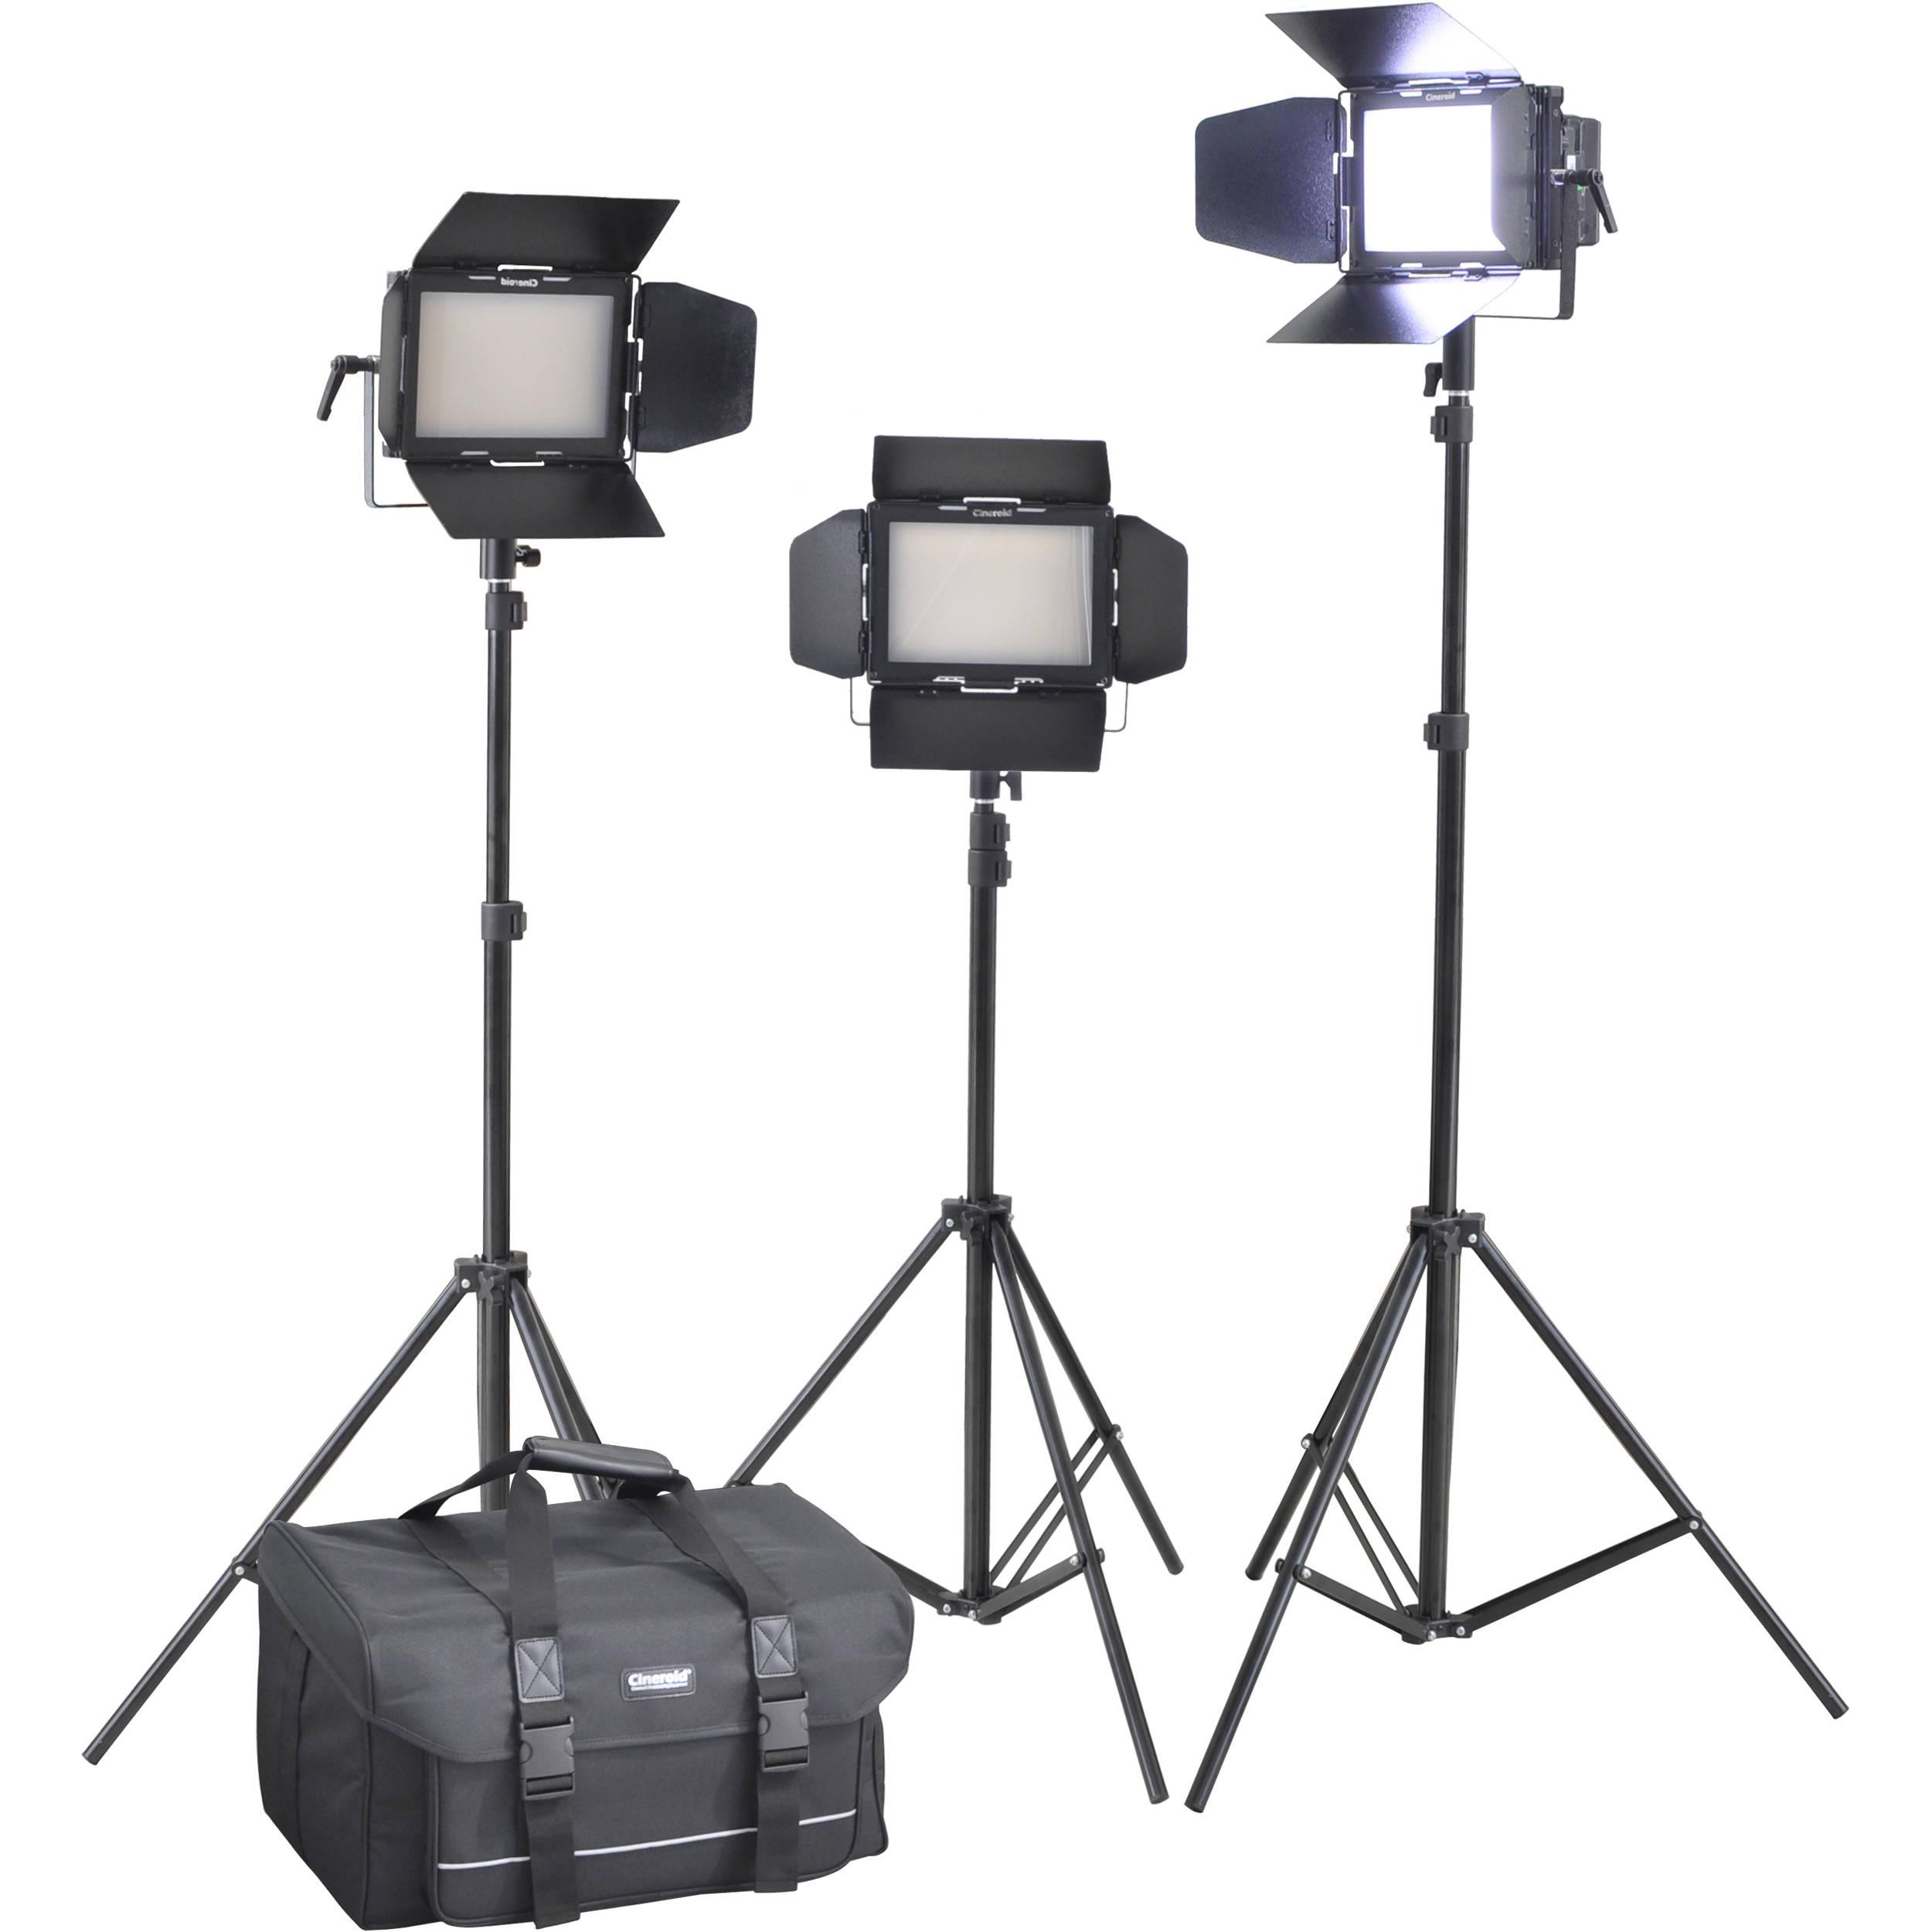 Cineroid LM400-3setV Professional LED 3-Light Kit LM400-3SETV